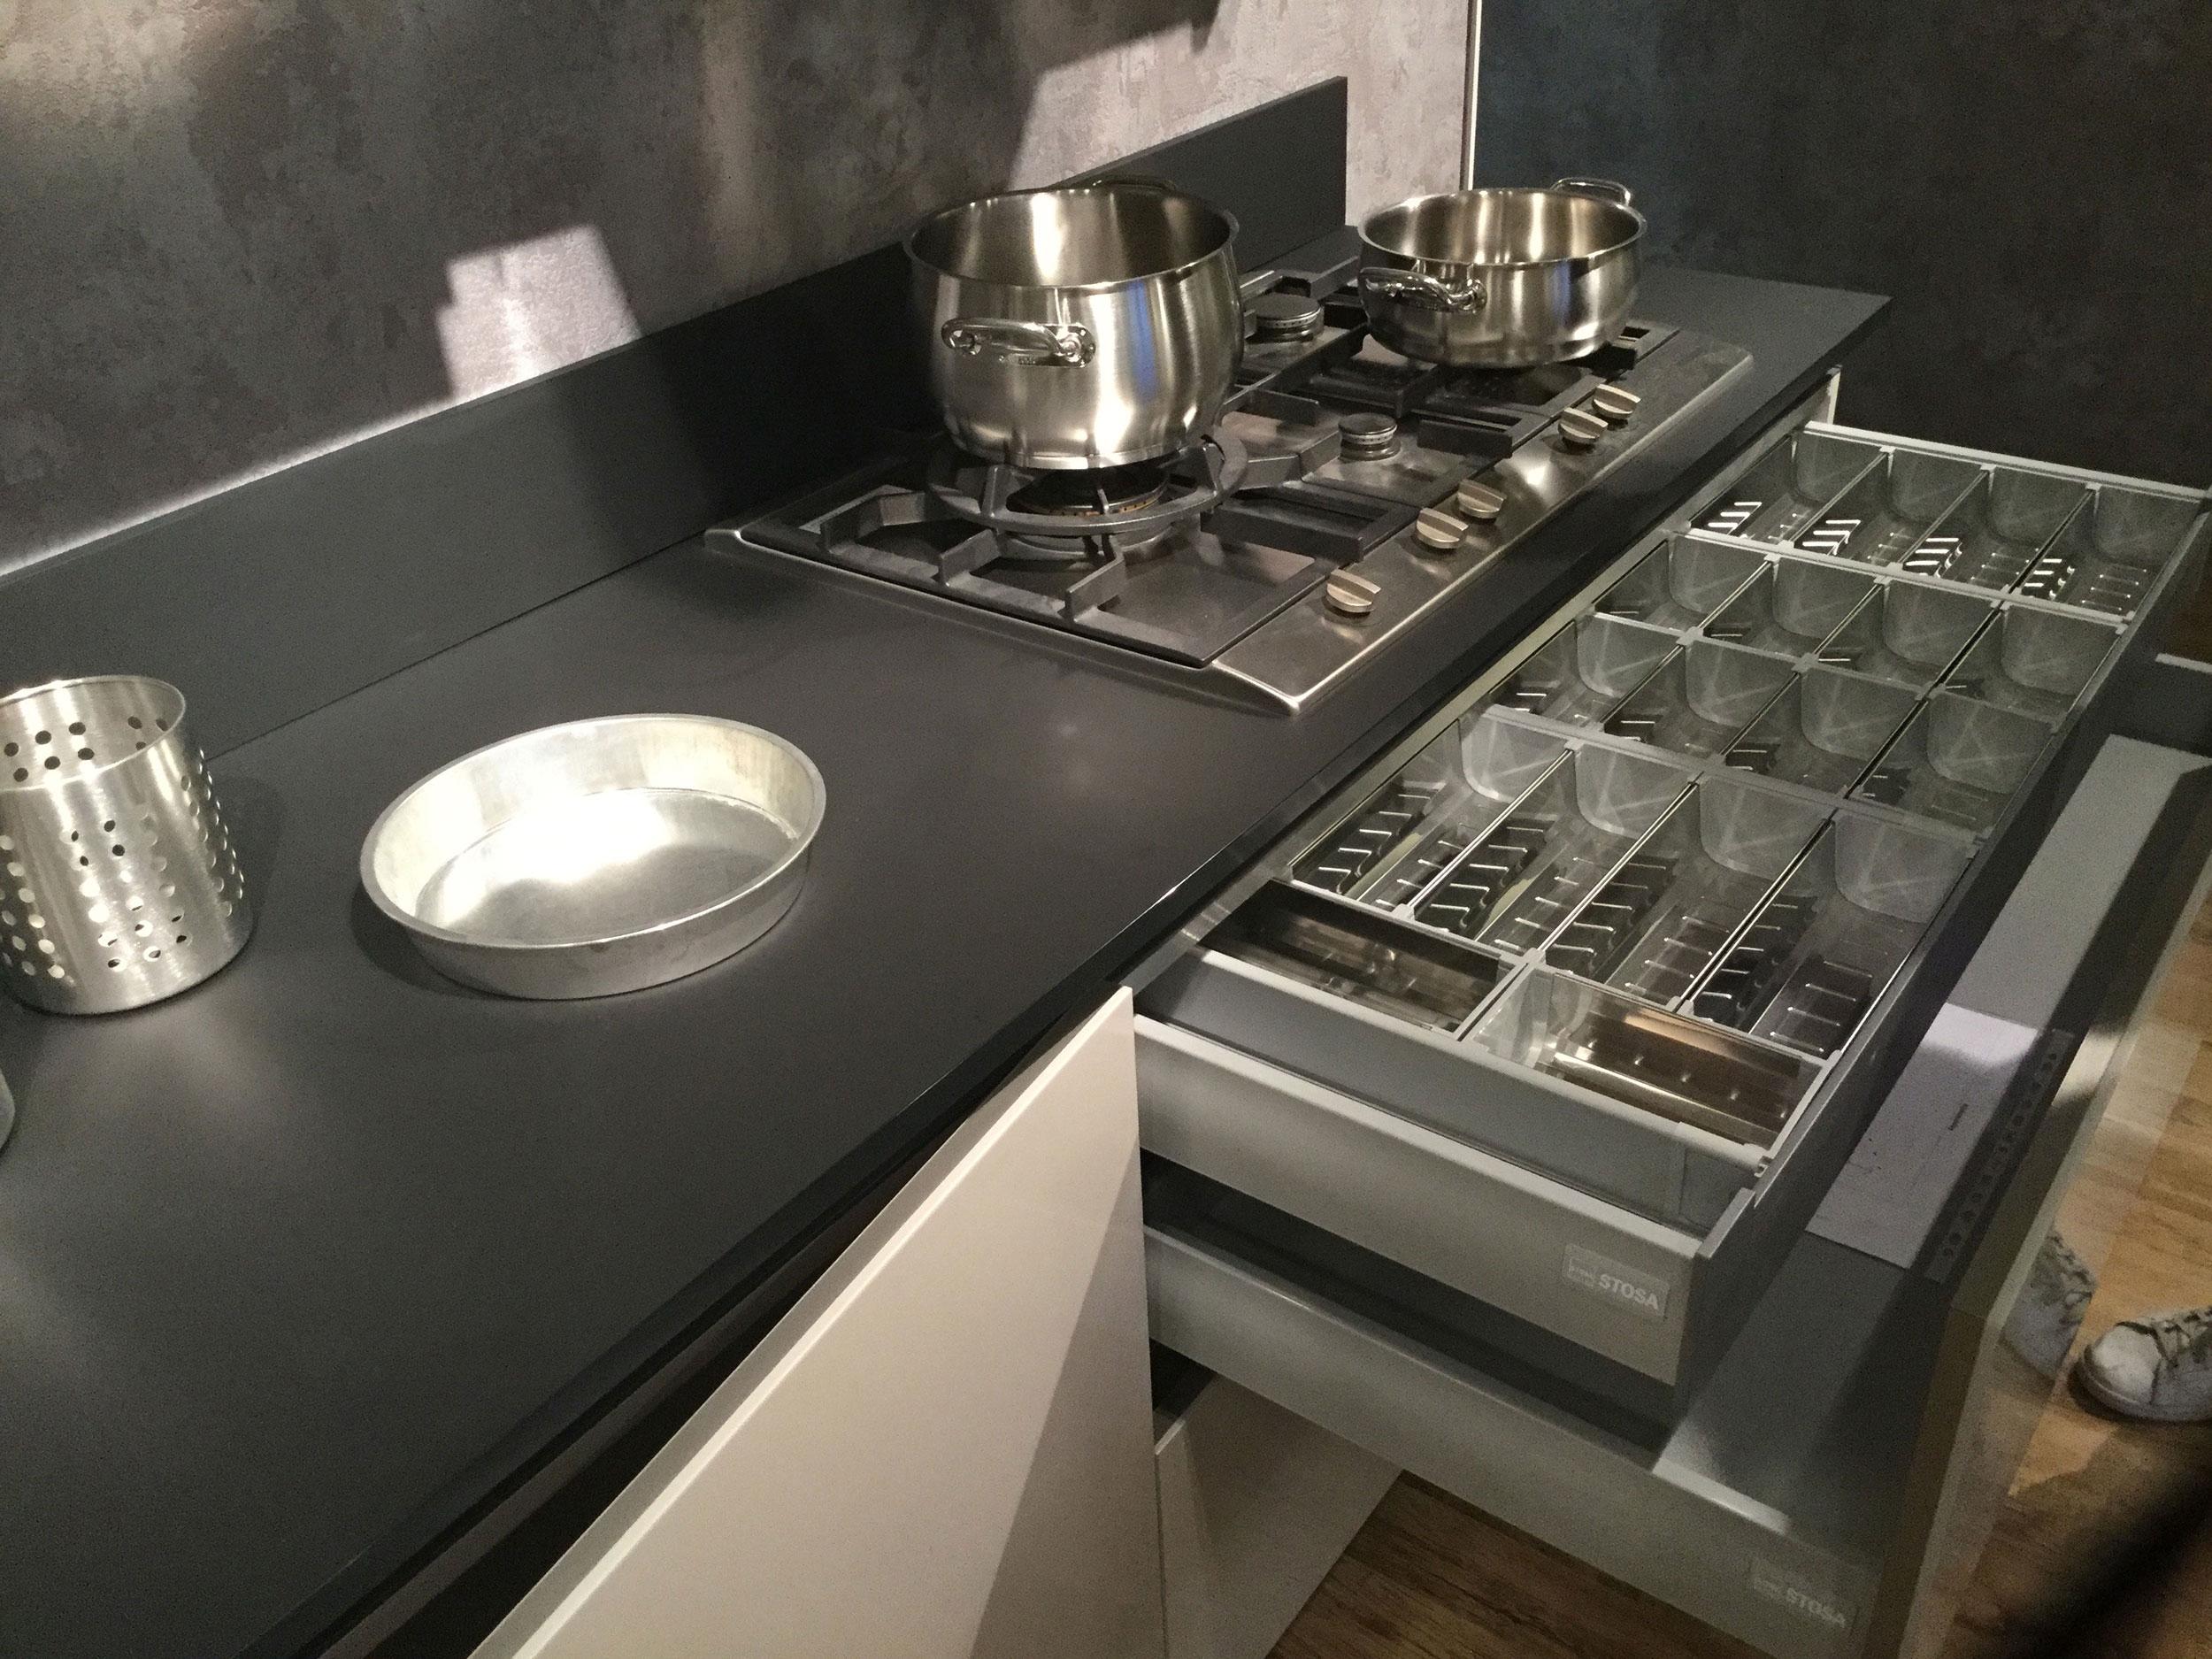 Cucina stosa cucine cucina stosa allegra eclettica for Piano cottura cucina